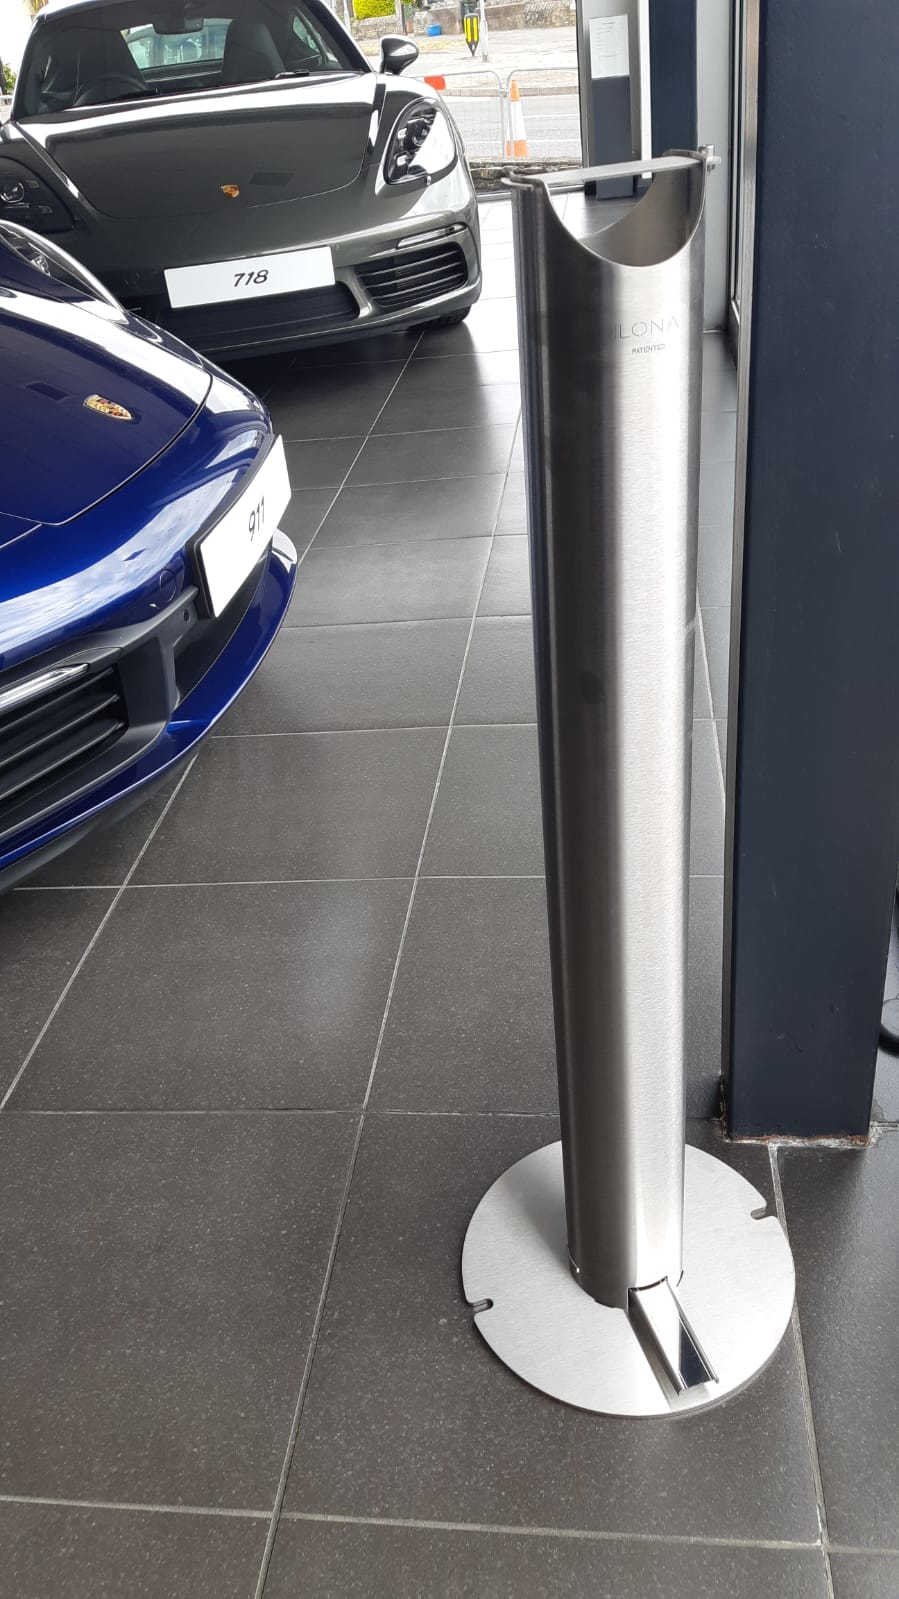 Ilone Hand Sanitiser Car Showroom 1